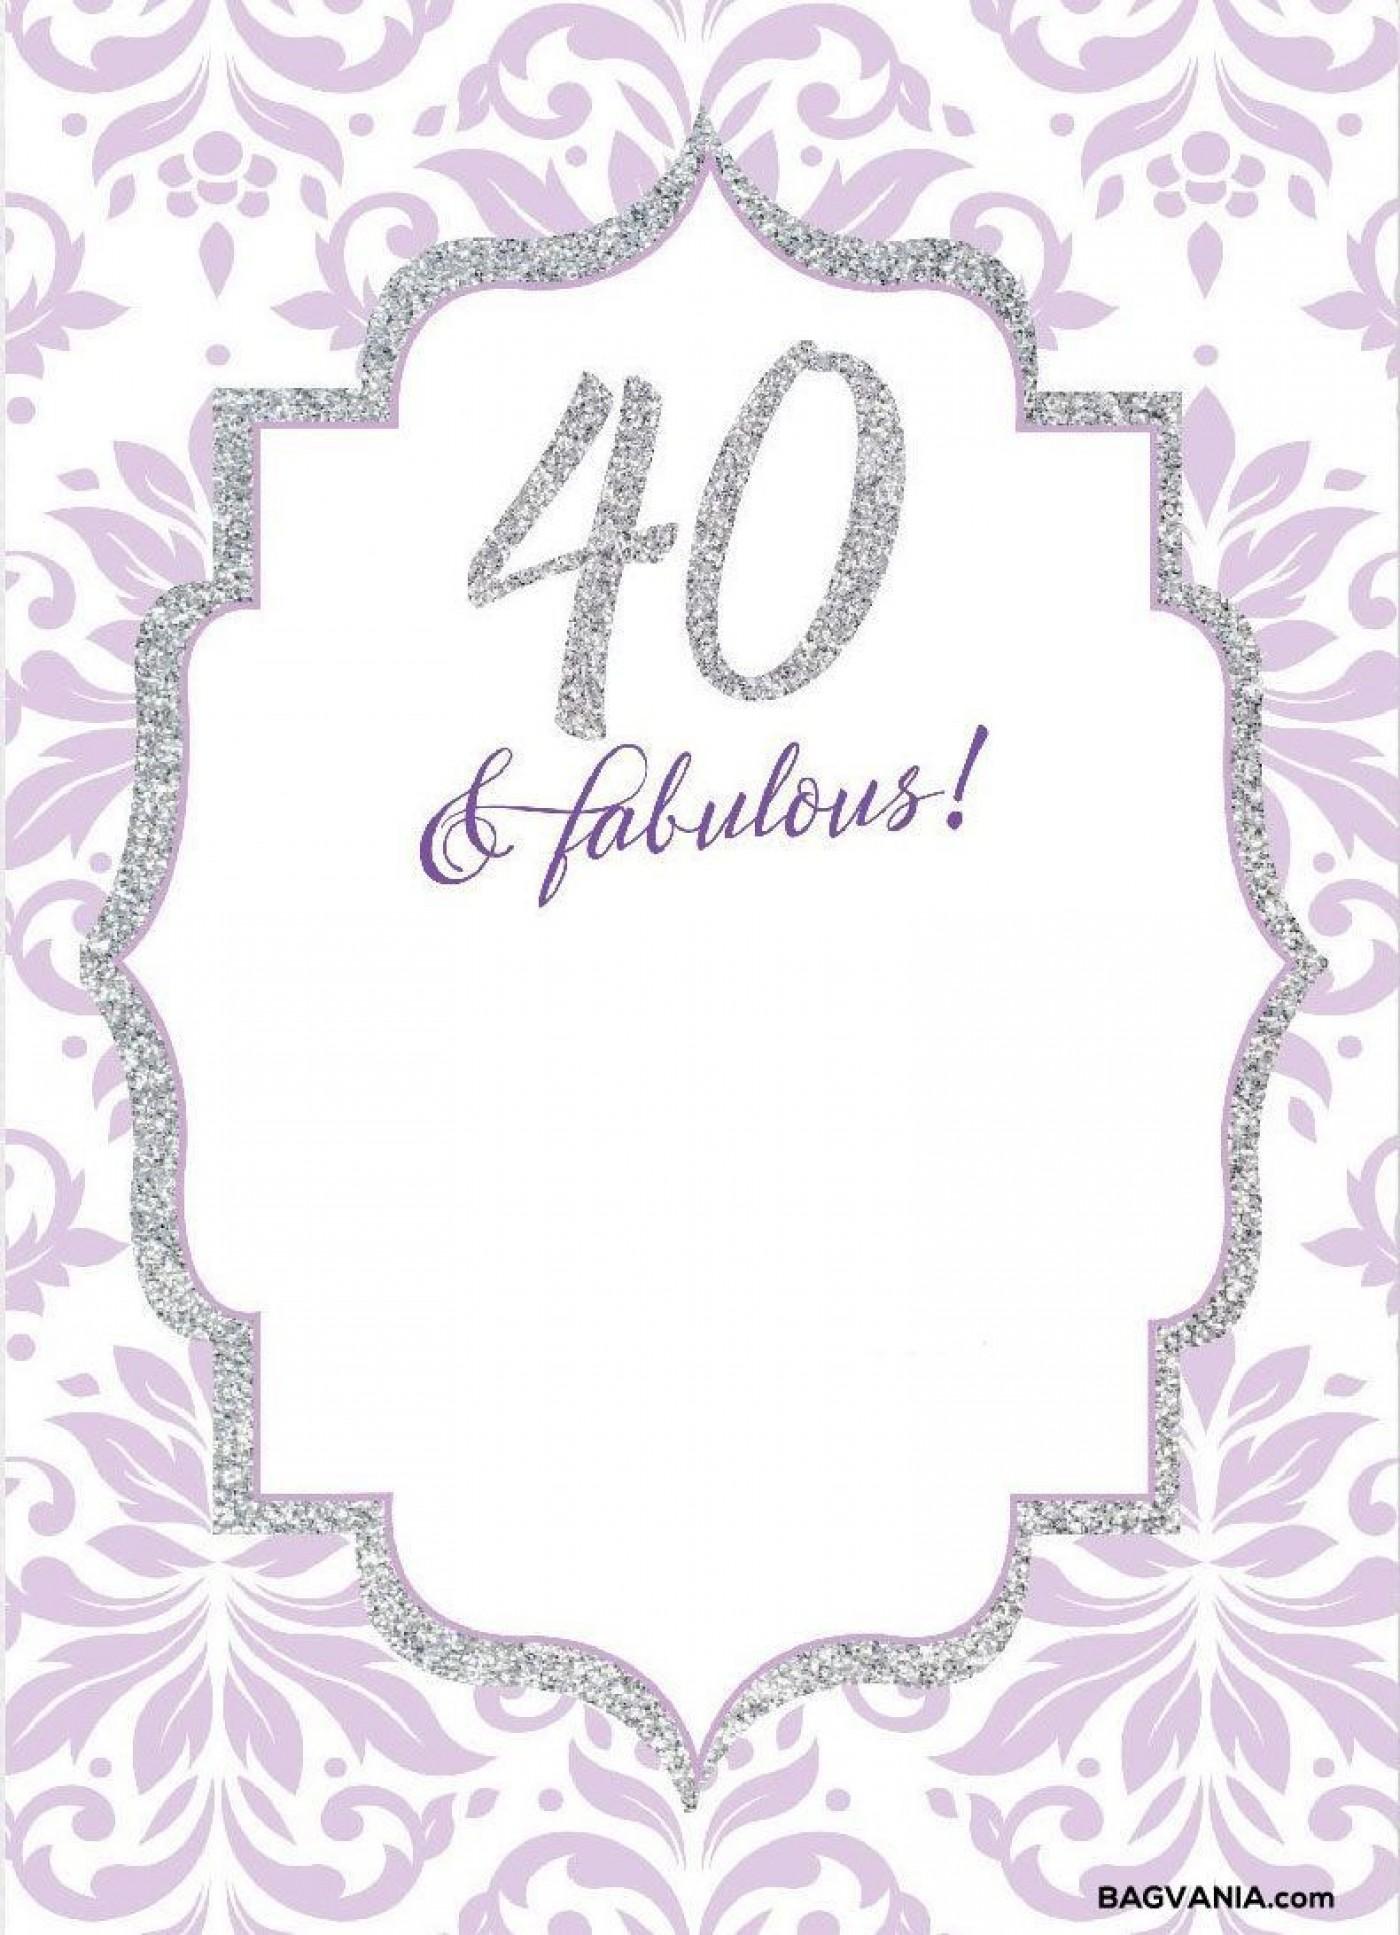 008 Wonderful 40th Birthday Party Invite Template Free Idea 1400